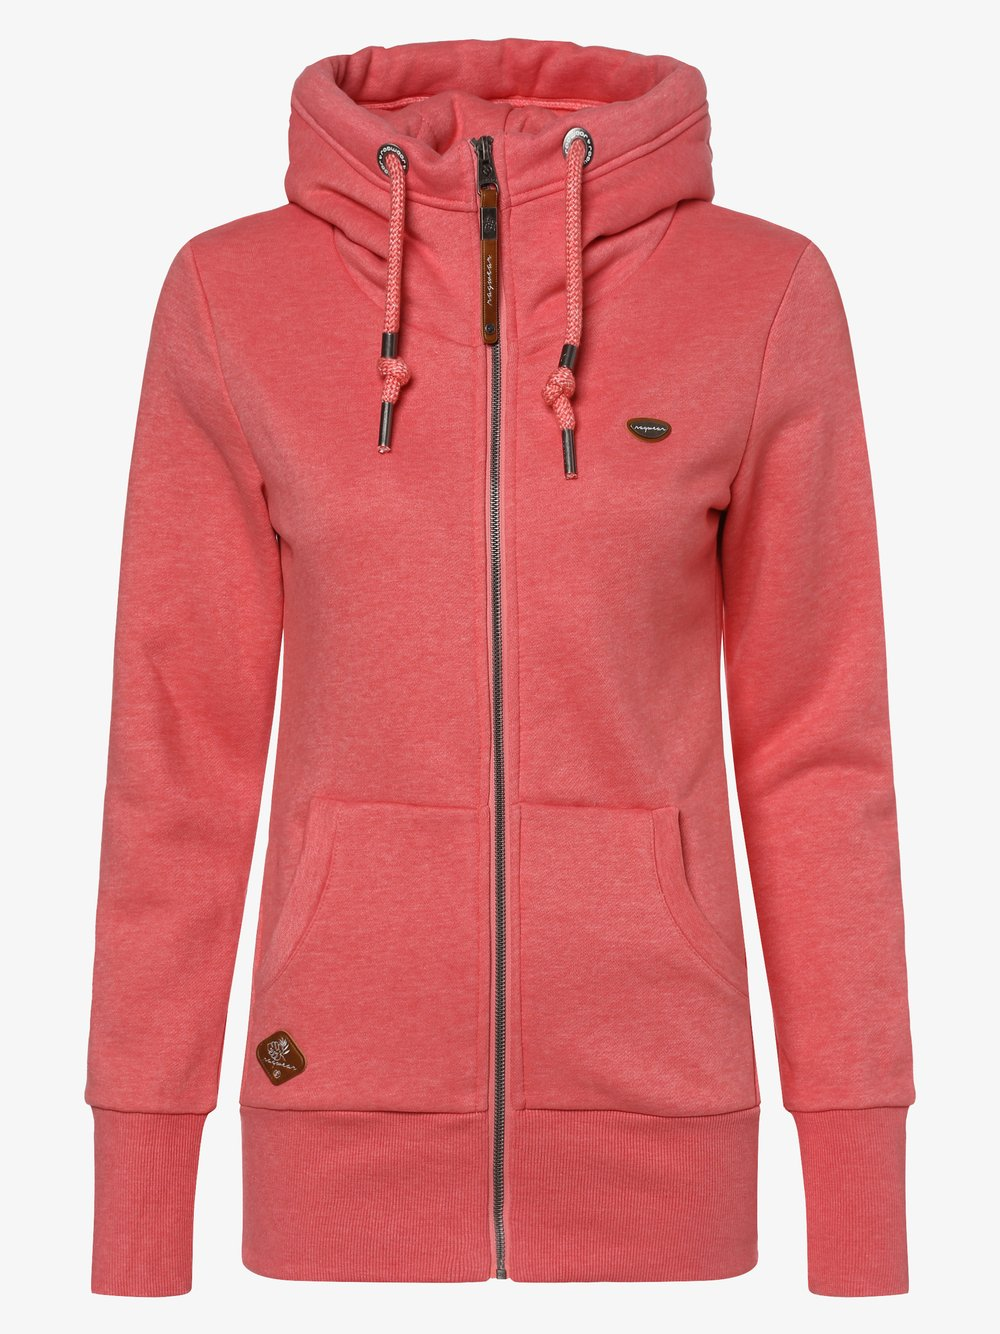 Ragwear - Damska bluza rozpinana – Neska Zip, różowy